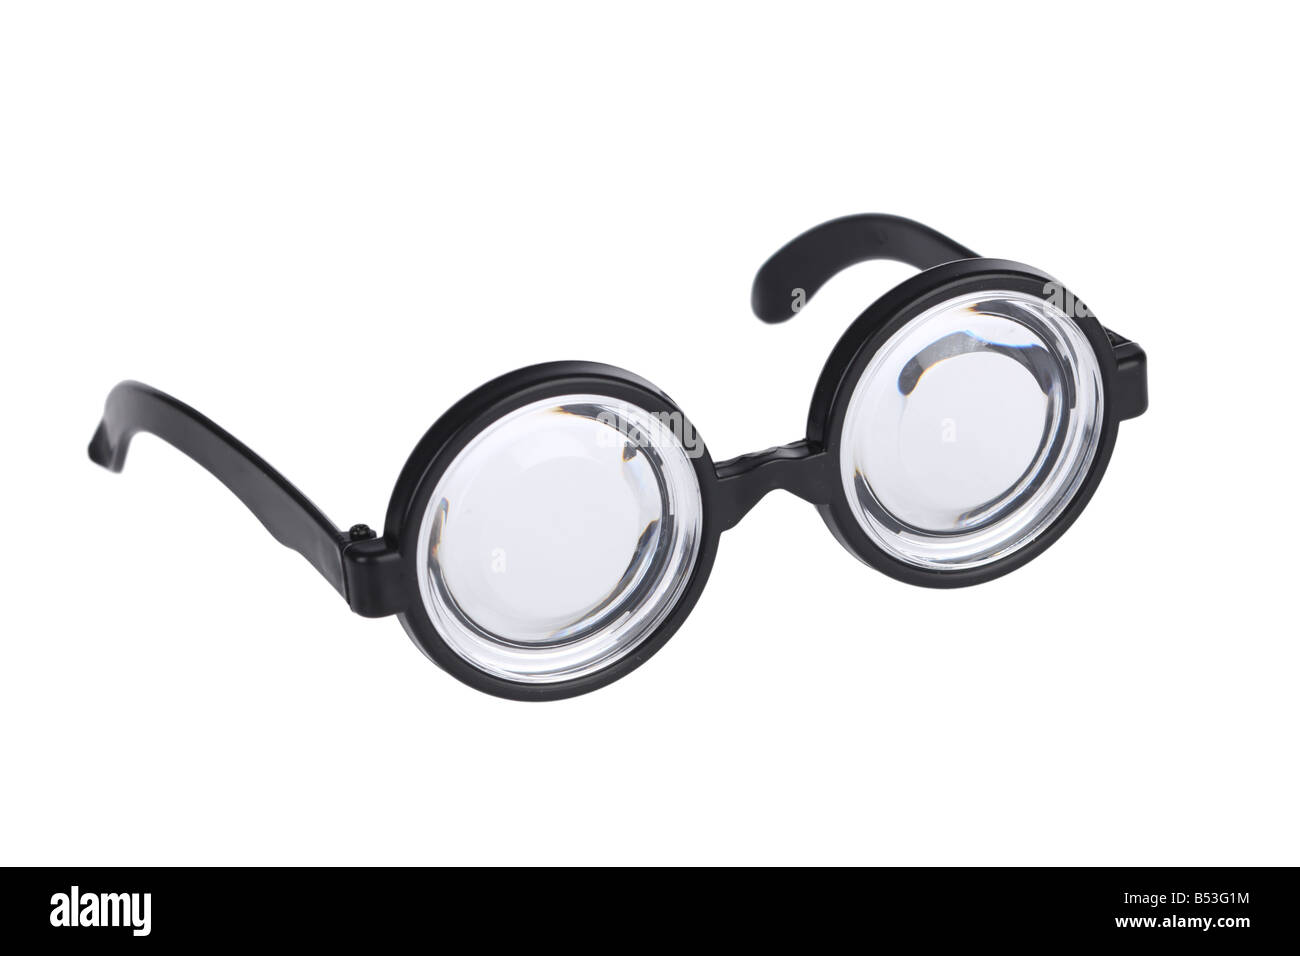 Nerd glasses cutout isolated on white background - Stock Image